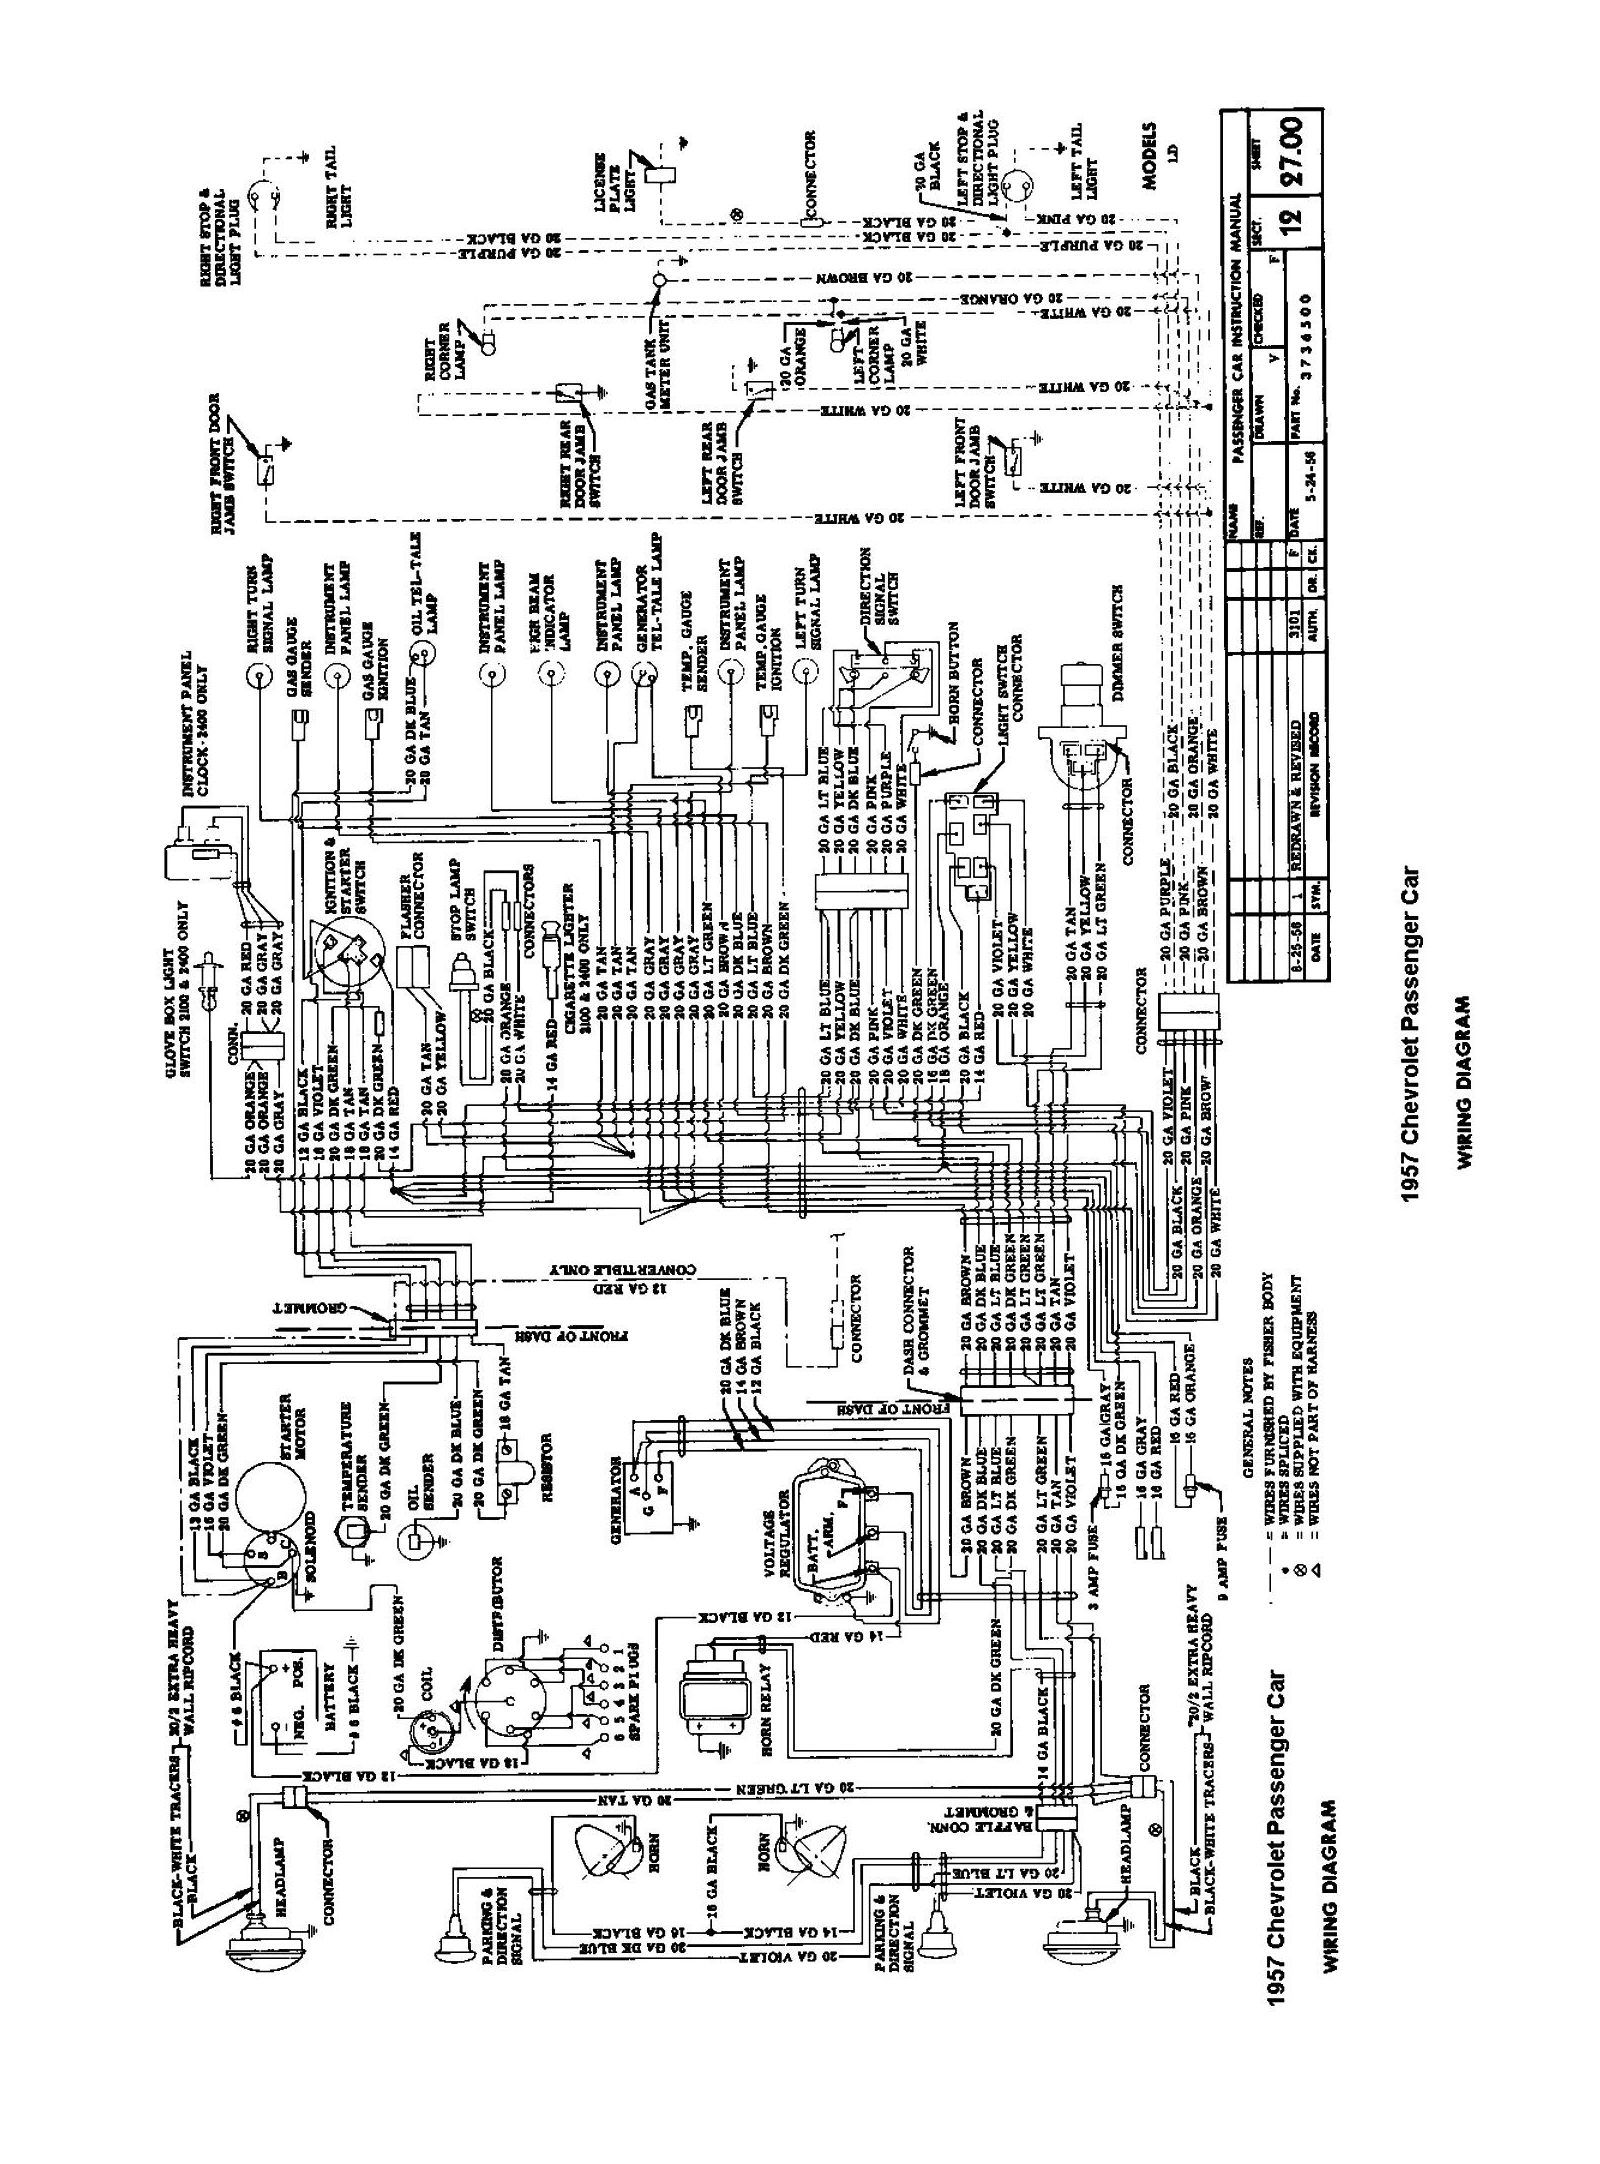 57 Chevy Wiring Diagram Diagram 1957 Chevrolet Wire